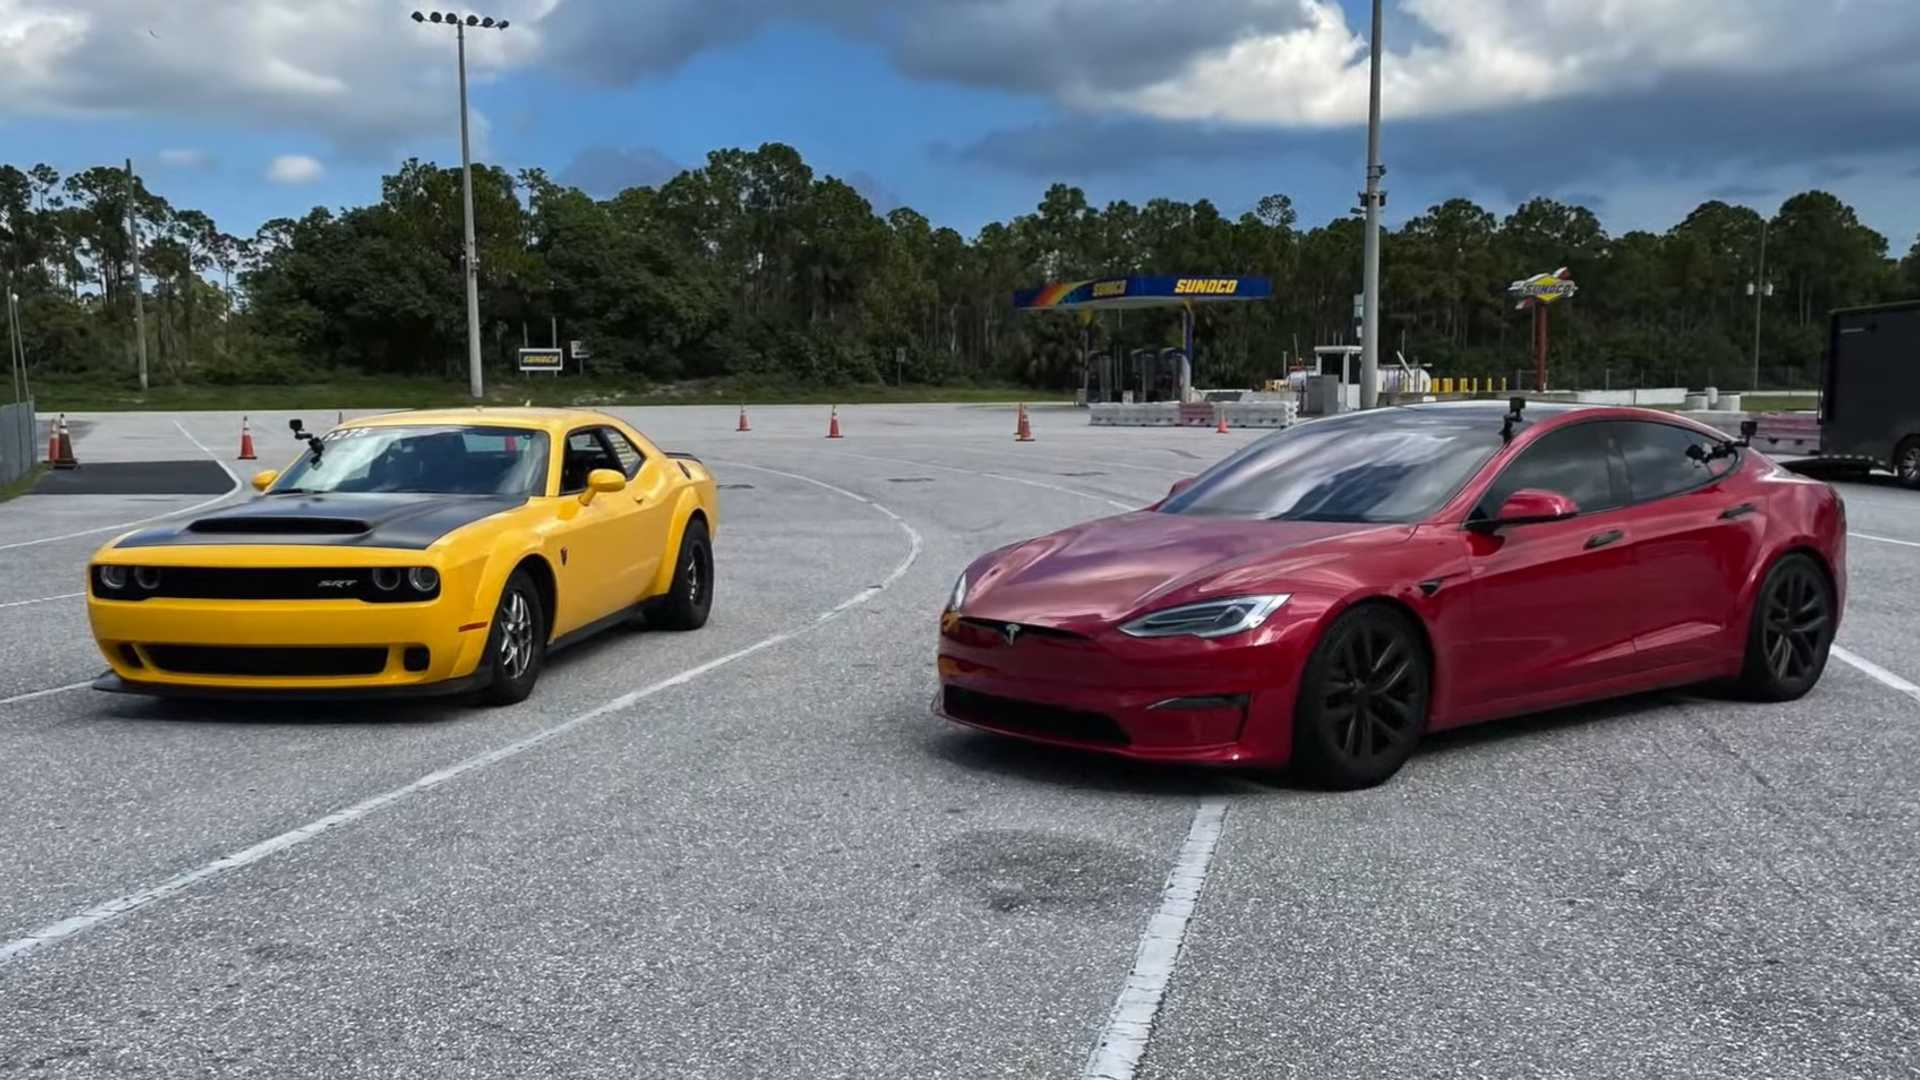 Dodge Demon Vs Tesla Model S Plaid Drag Race Has A Clear Winner